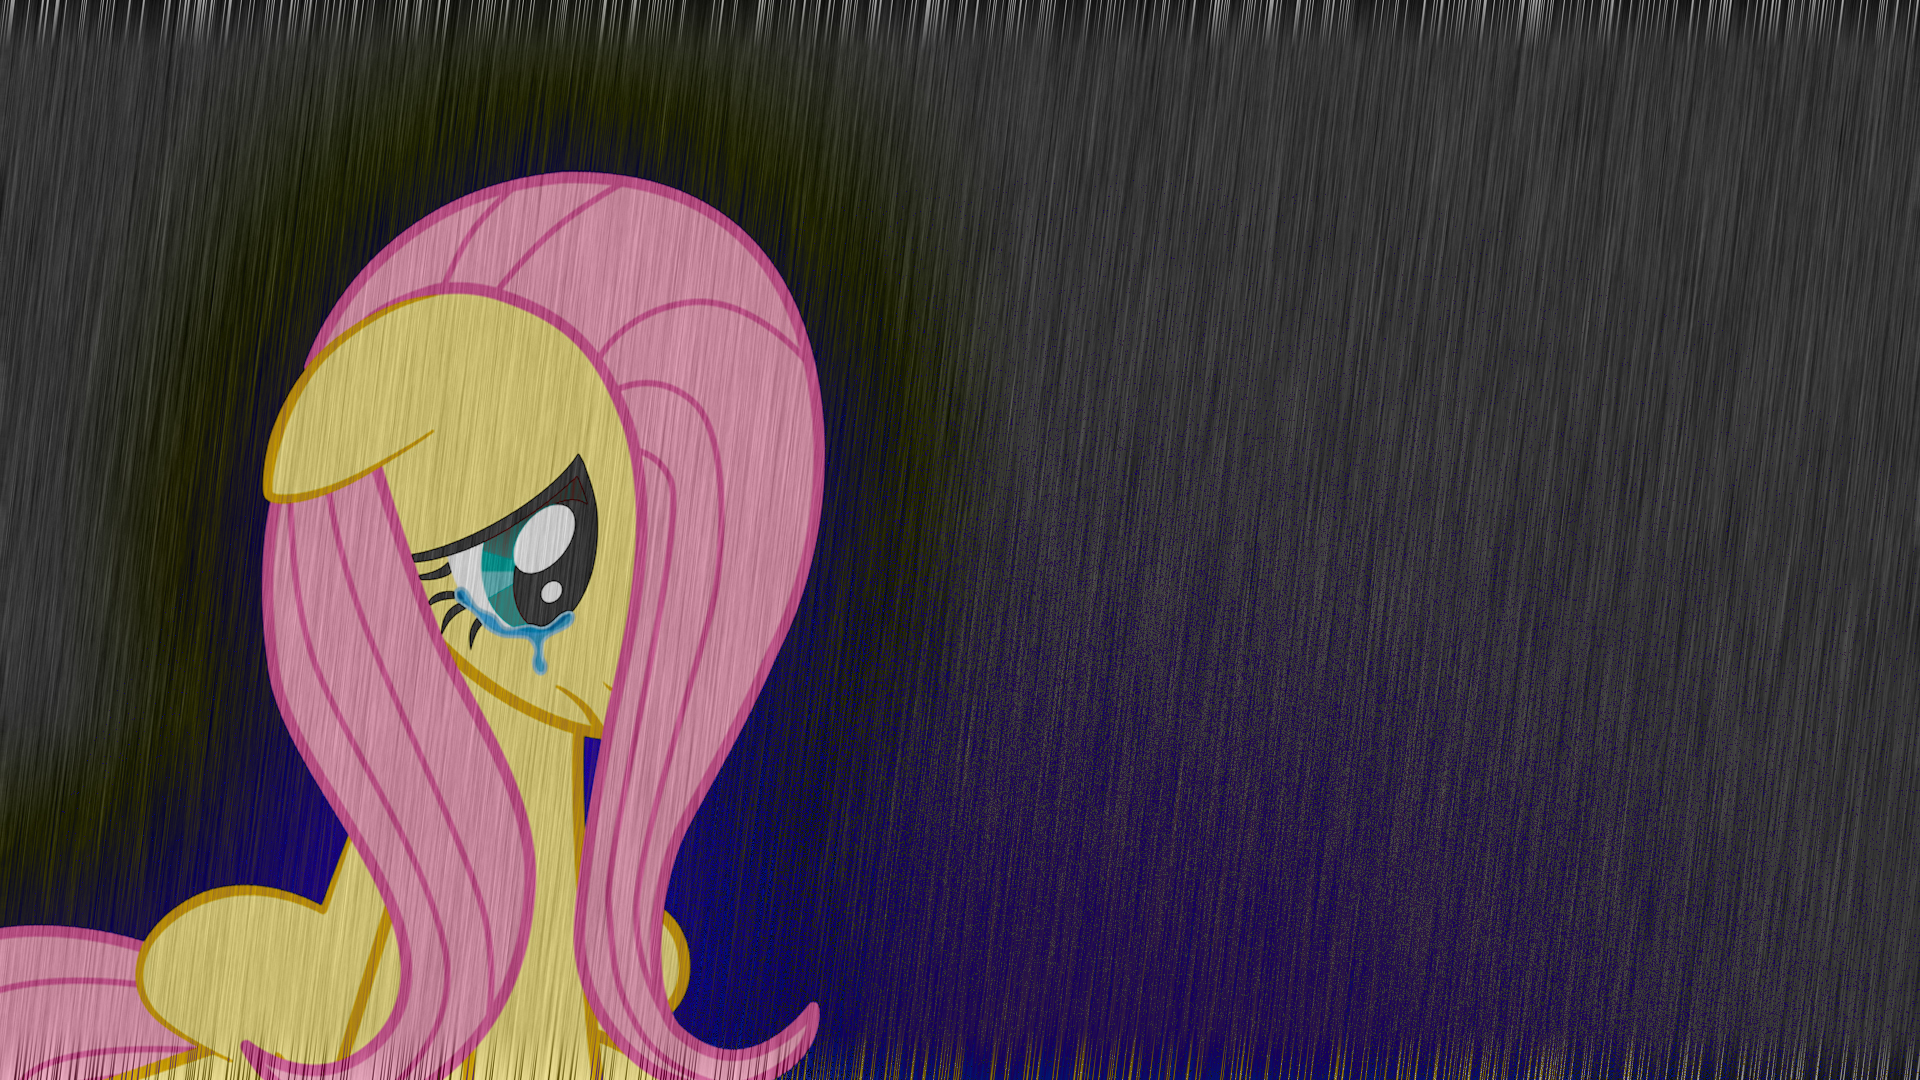 depressed fluttershy - photo #20